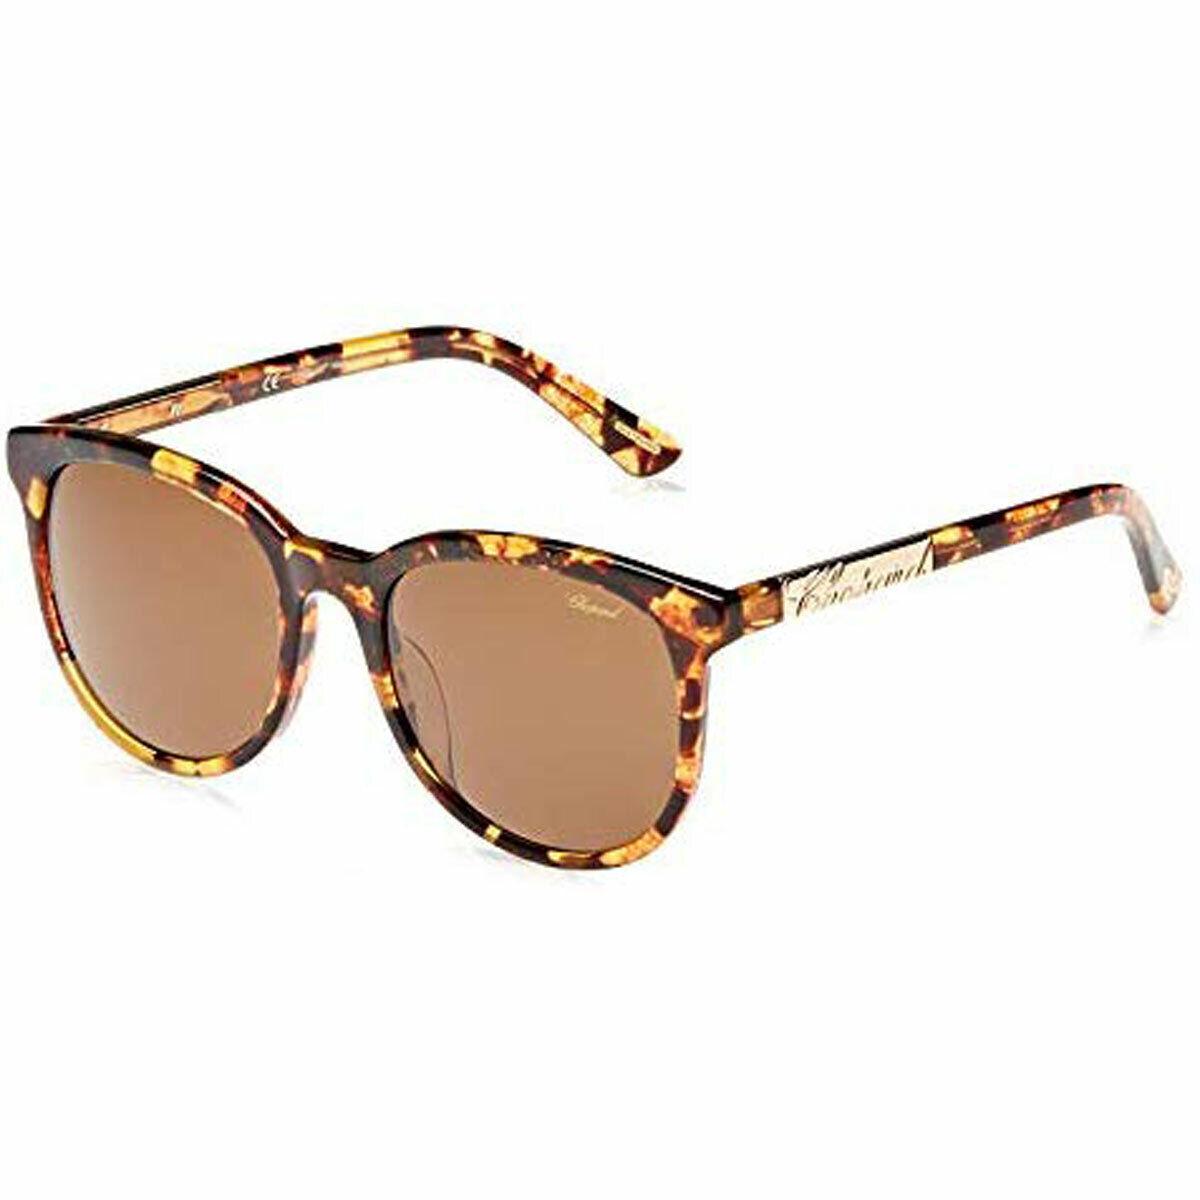 Chopard Women's Sunglasses Havana Frame Brown Mirror Lens SCH171G-0AHR-57-19-140